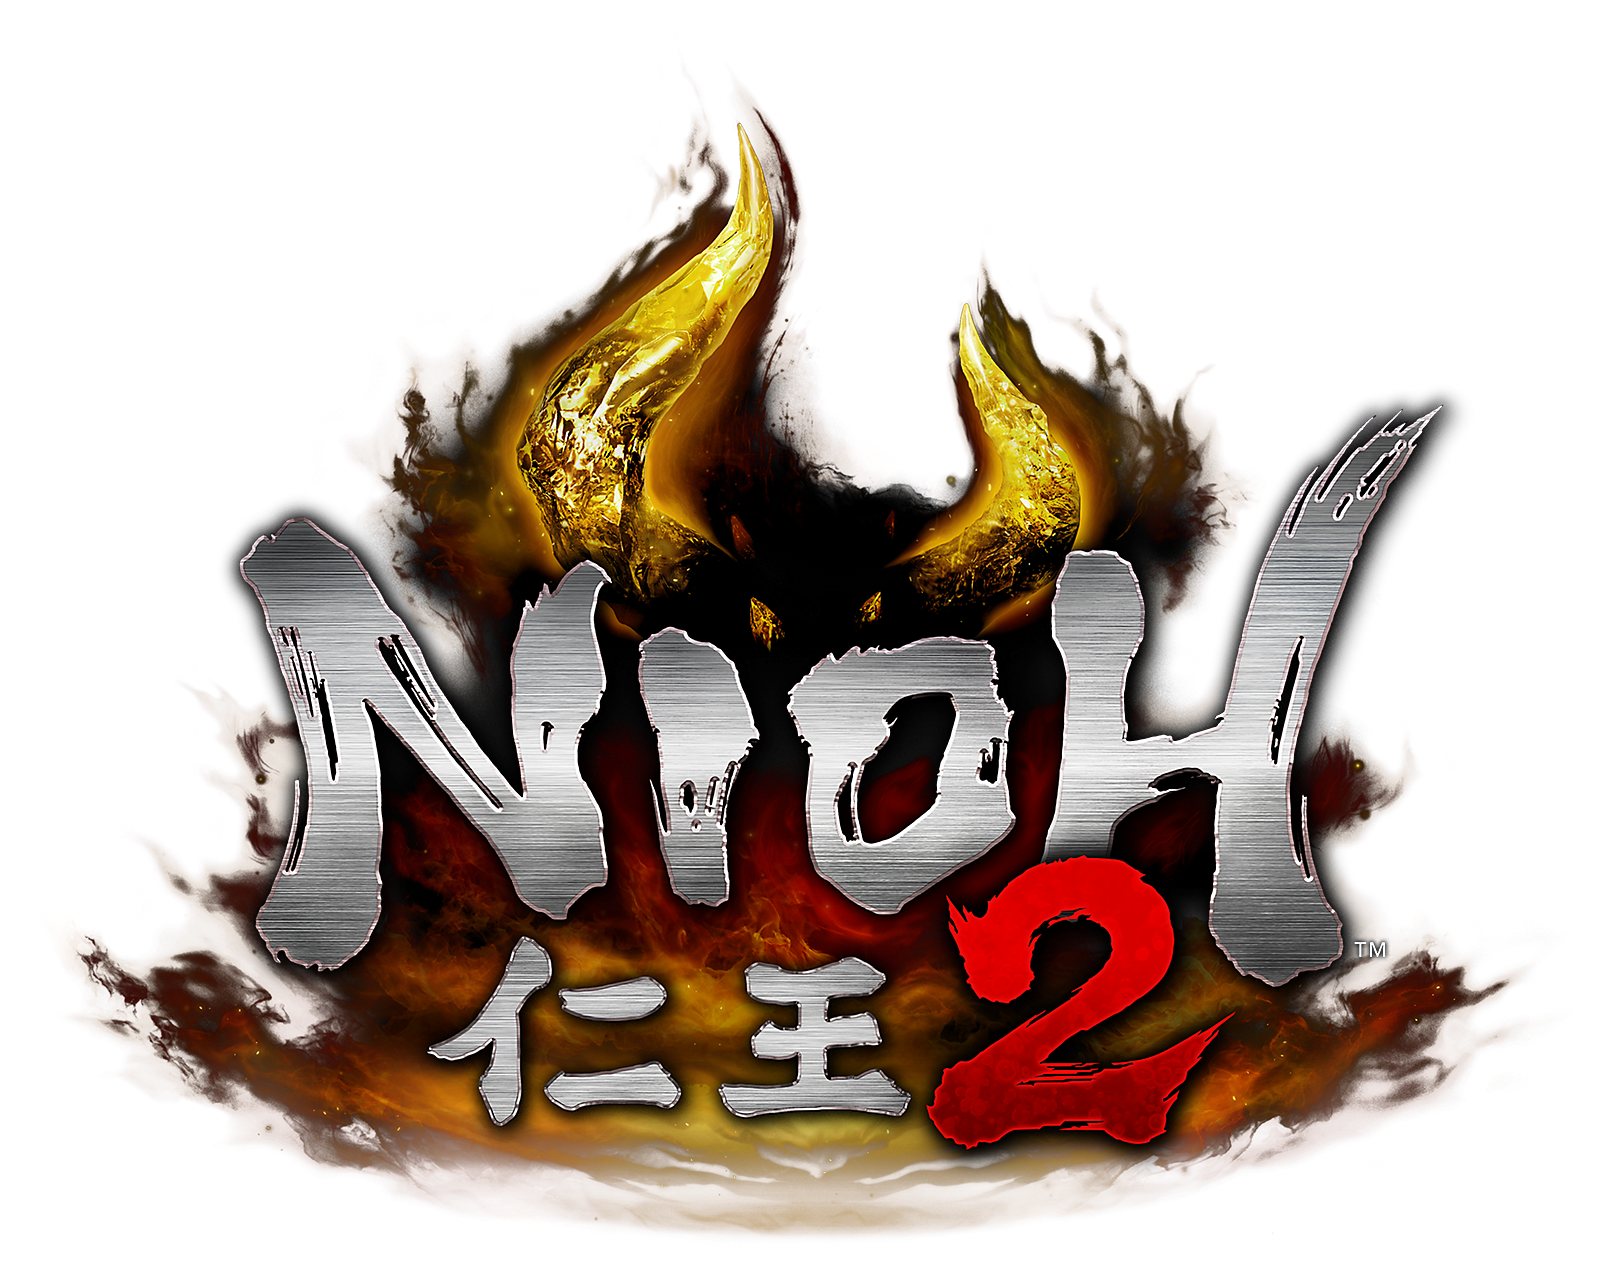 https://upload.wikimedia.org/wikipedia/fr/c/c7/Nioh_2_Logo.png